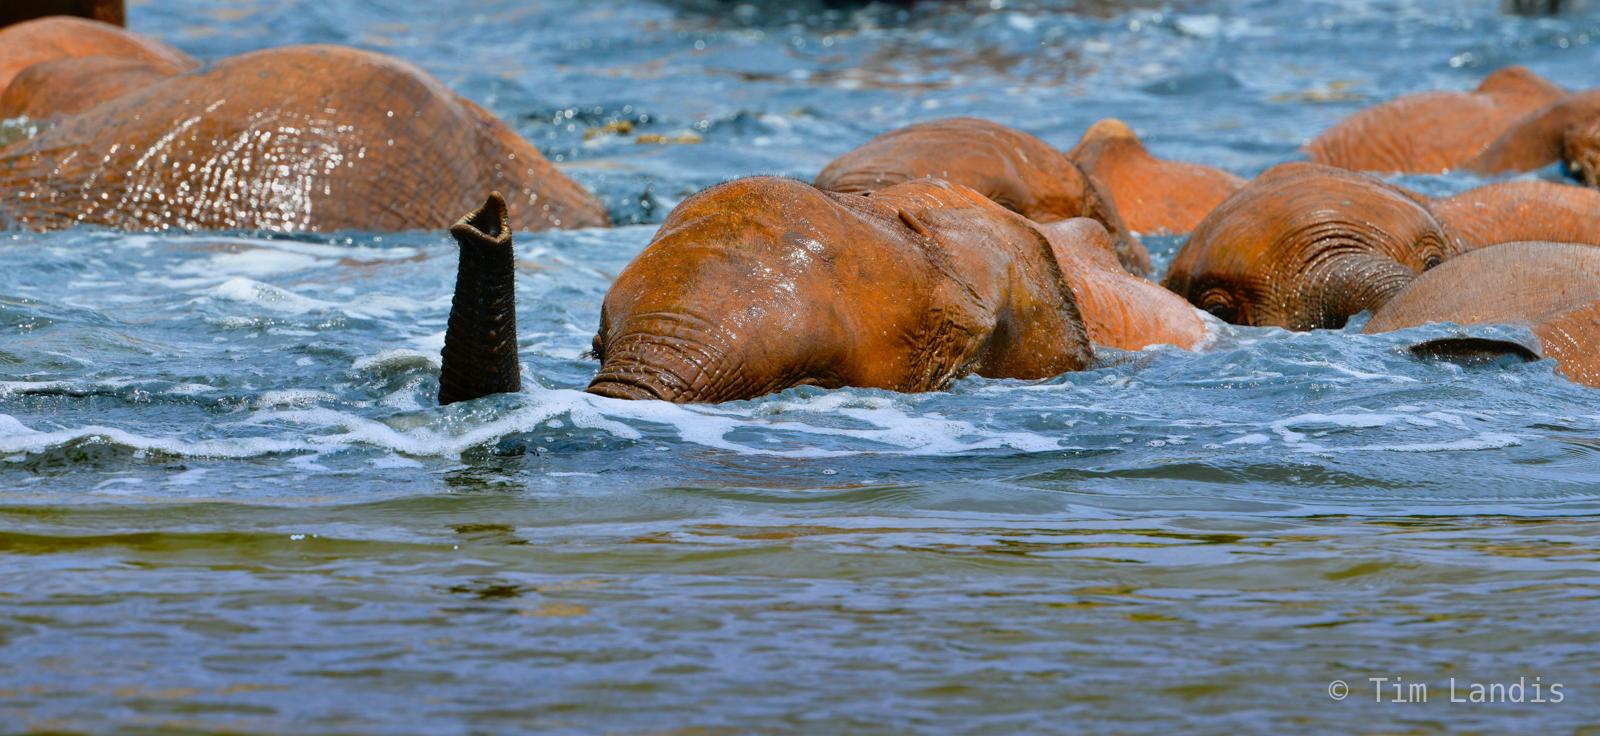 Elephant scuba gear